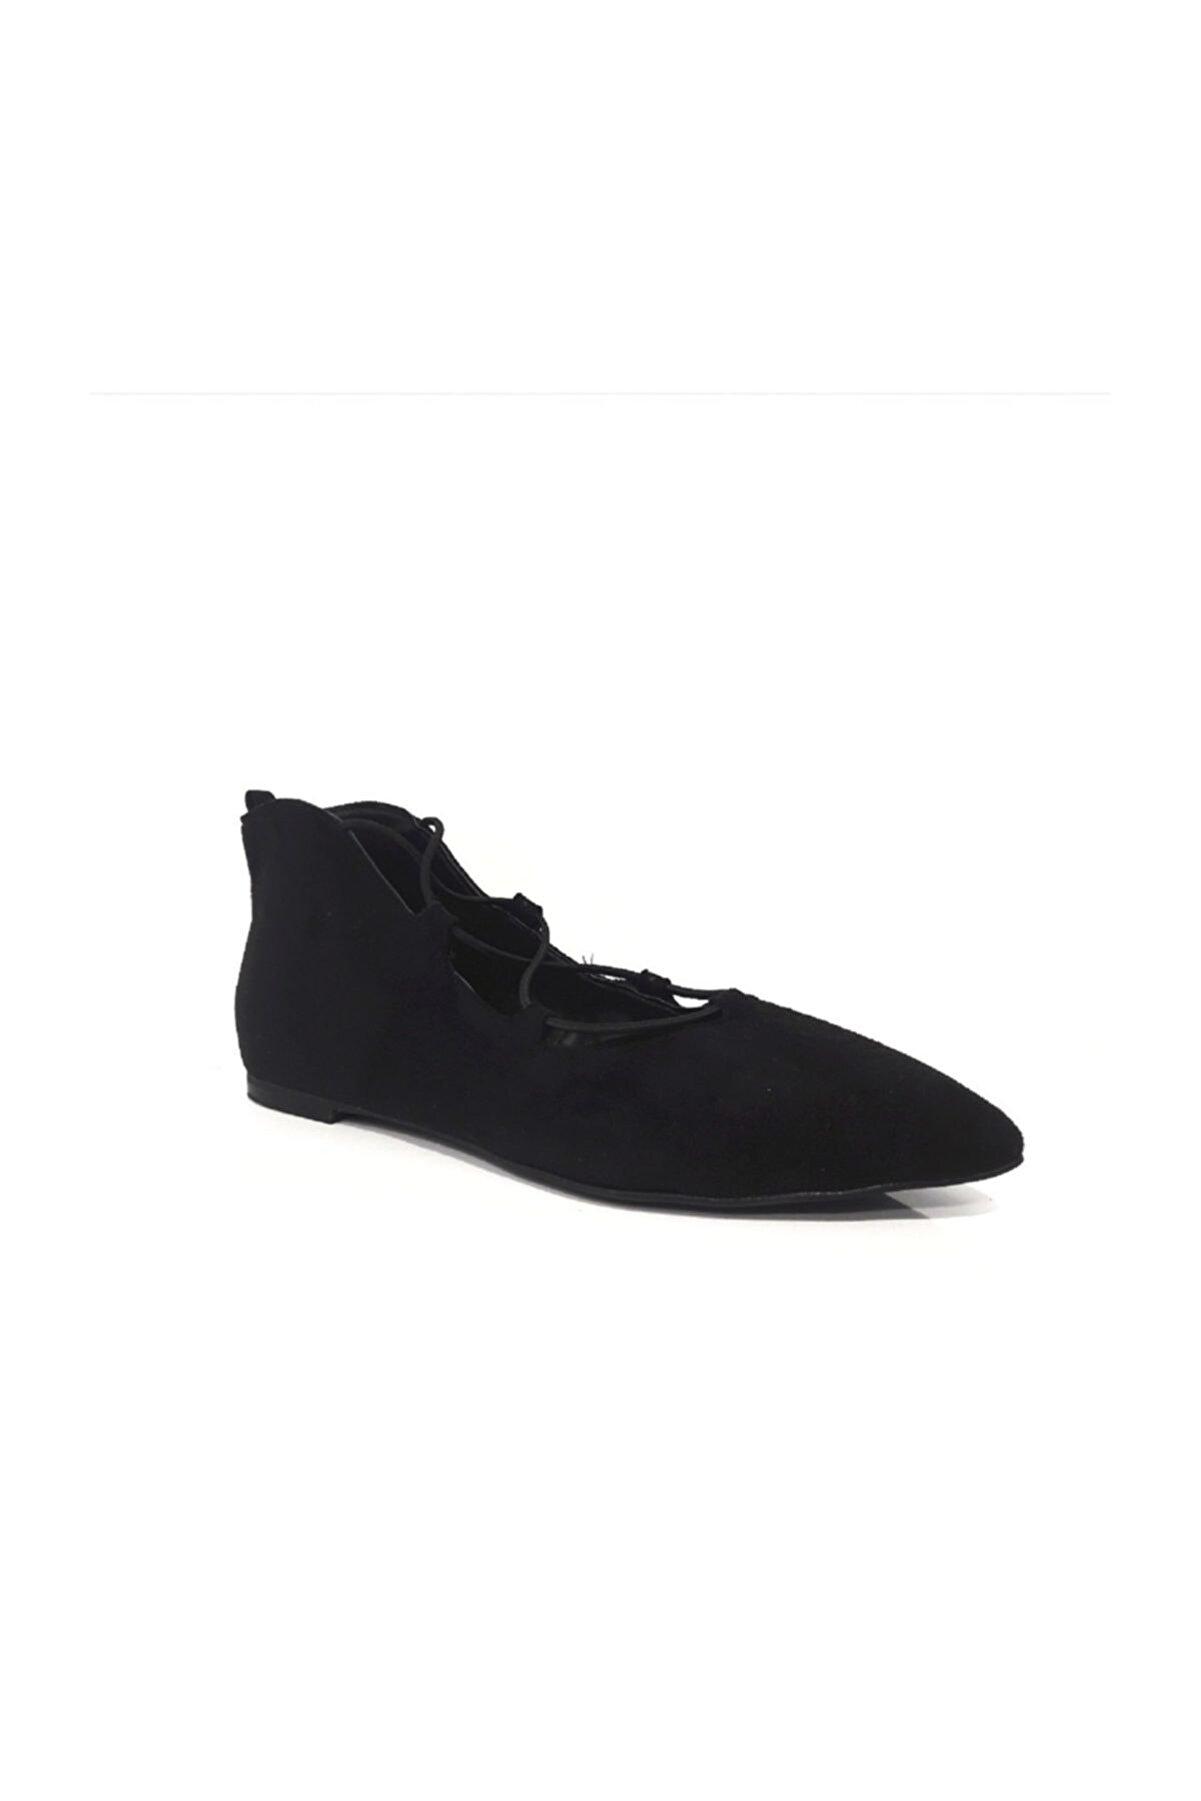 Divum Siyah Süet Ayakkabı